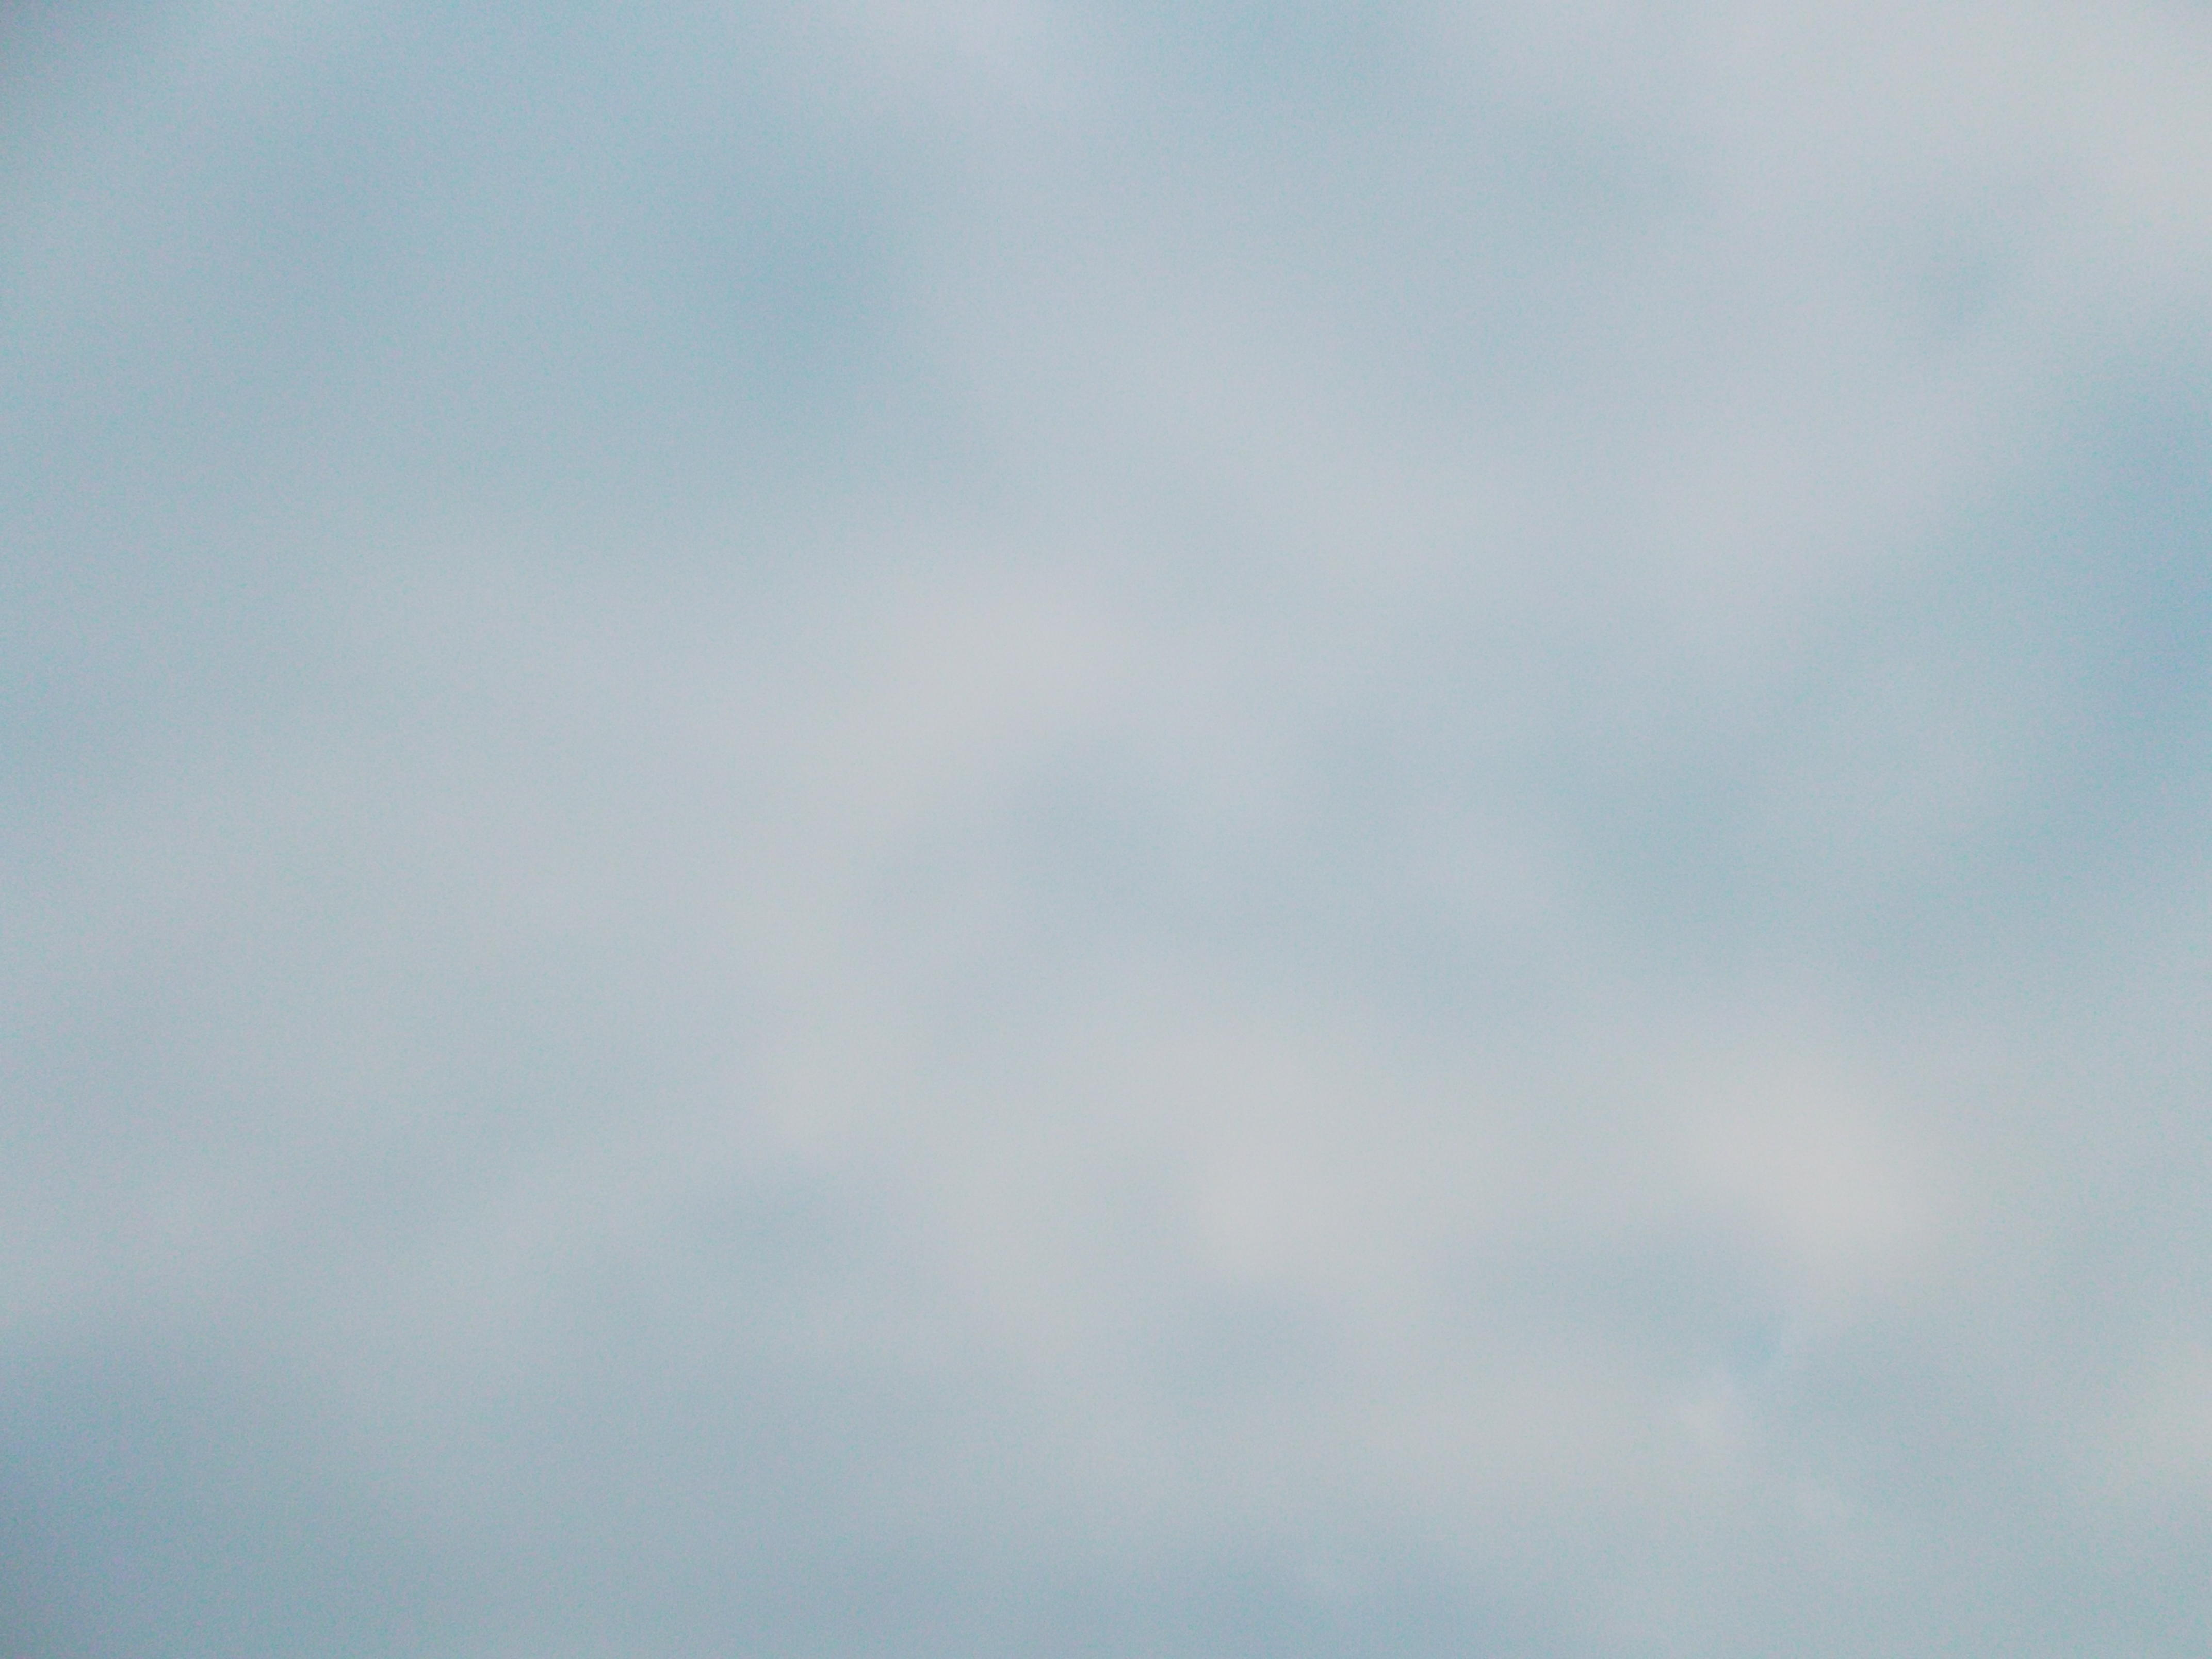 2013-02-23 Longitude -0.371 Latitude 49.182 Altitude 13 Heure 17h37